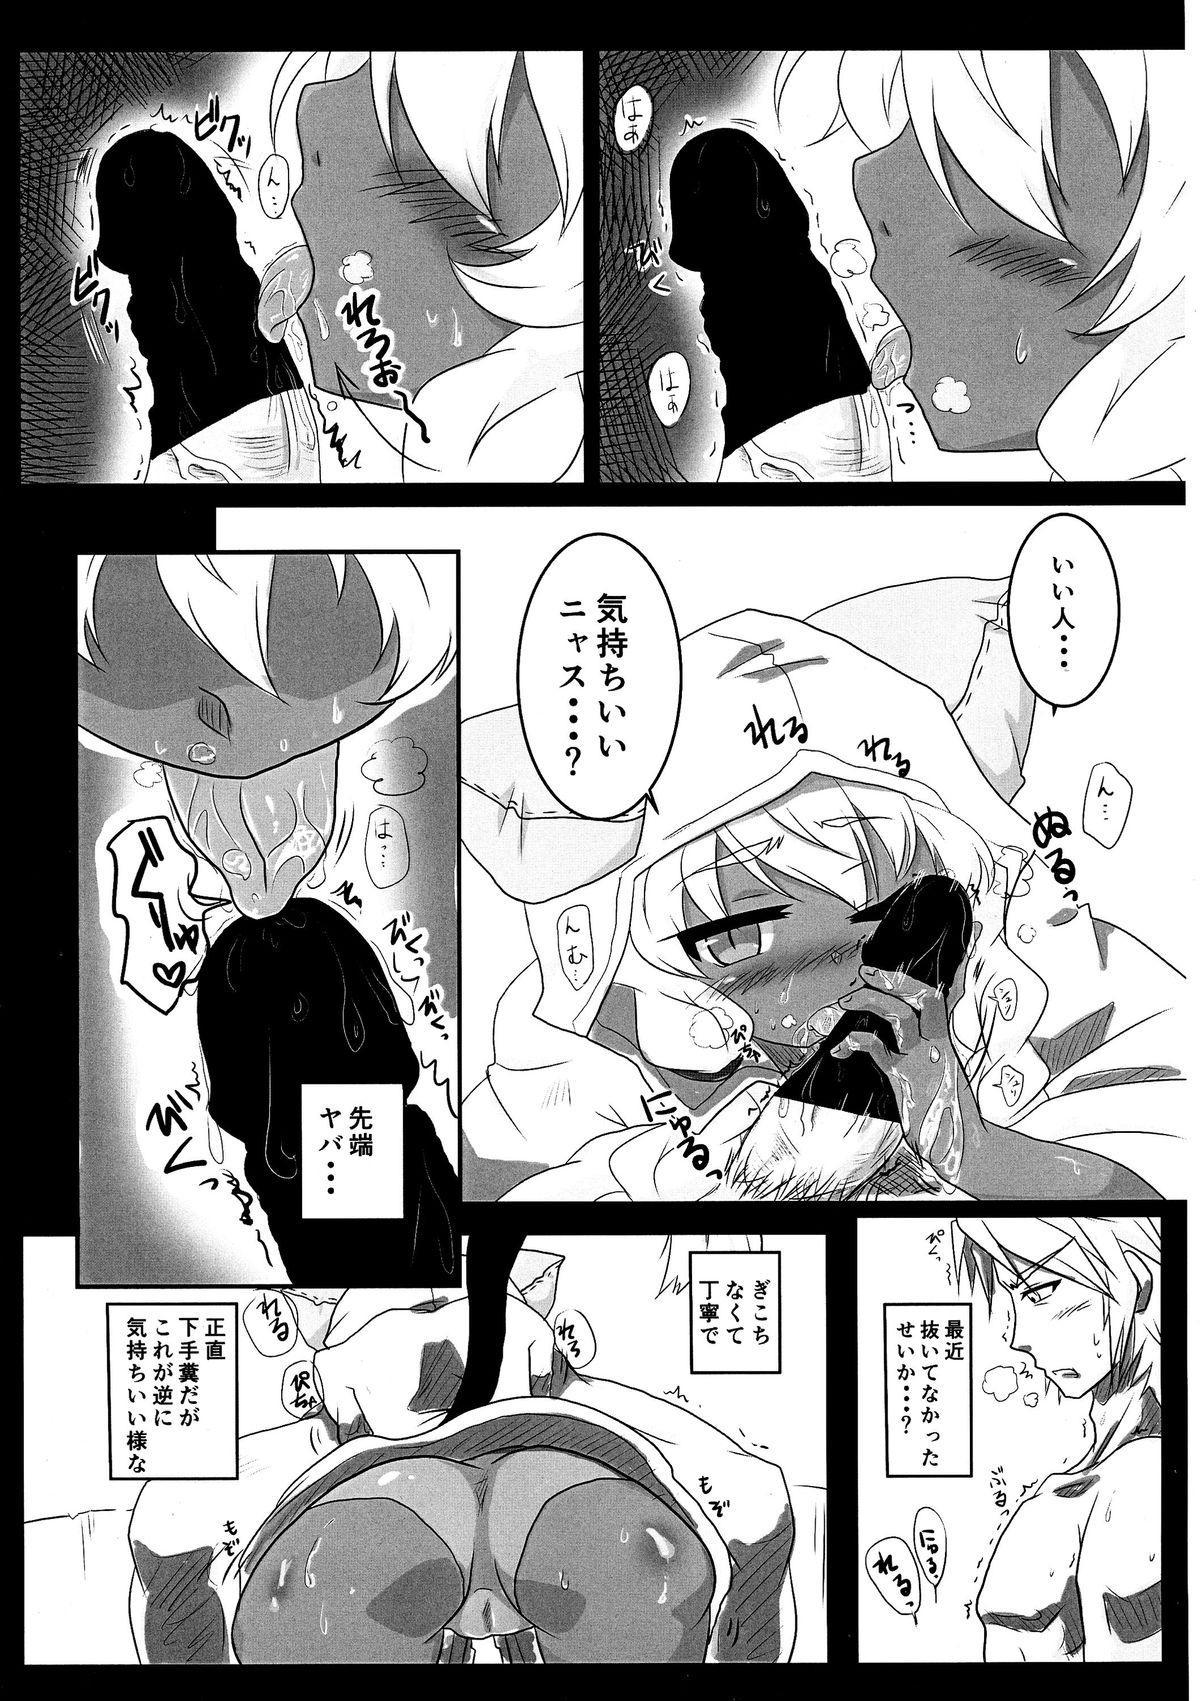 Tao no Ongaeshi 18